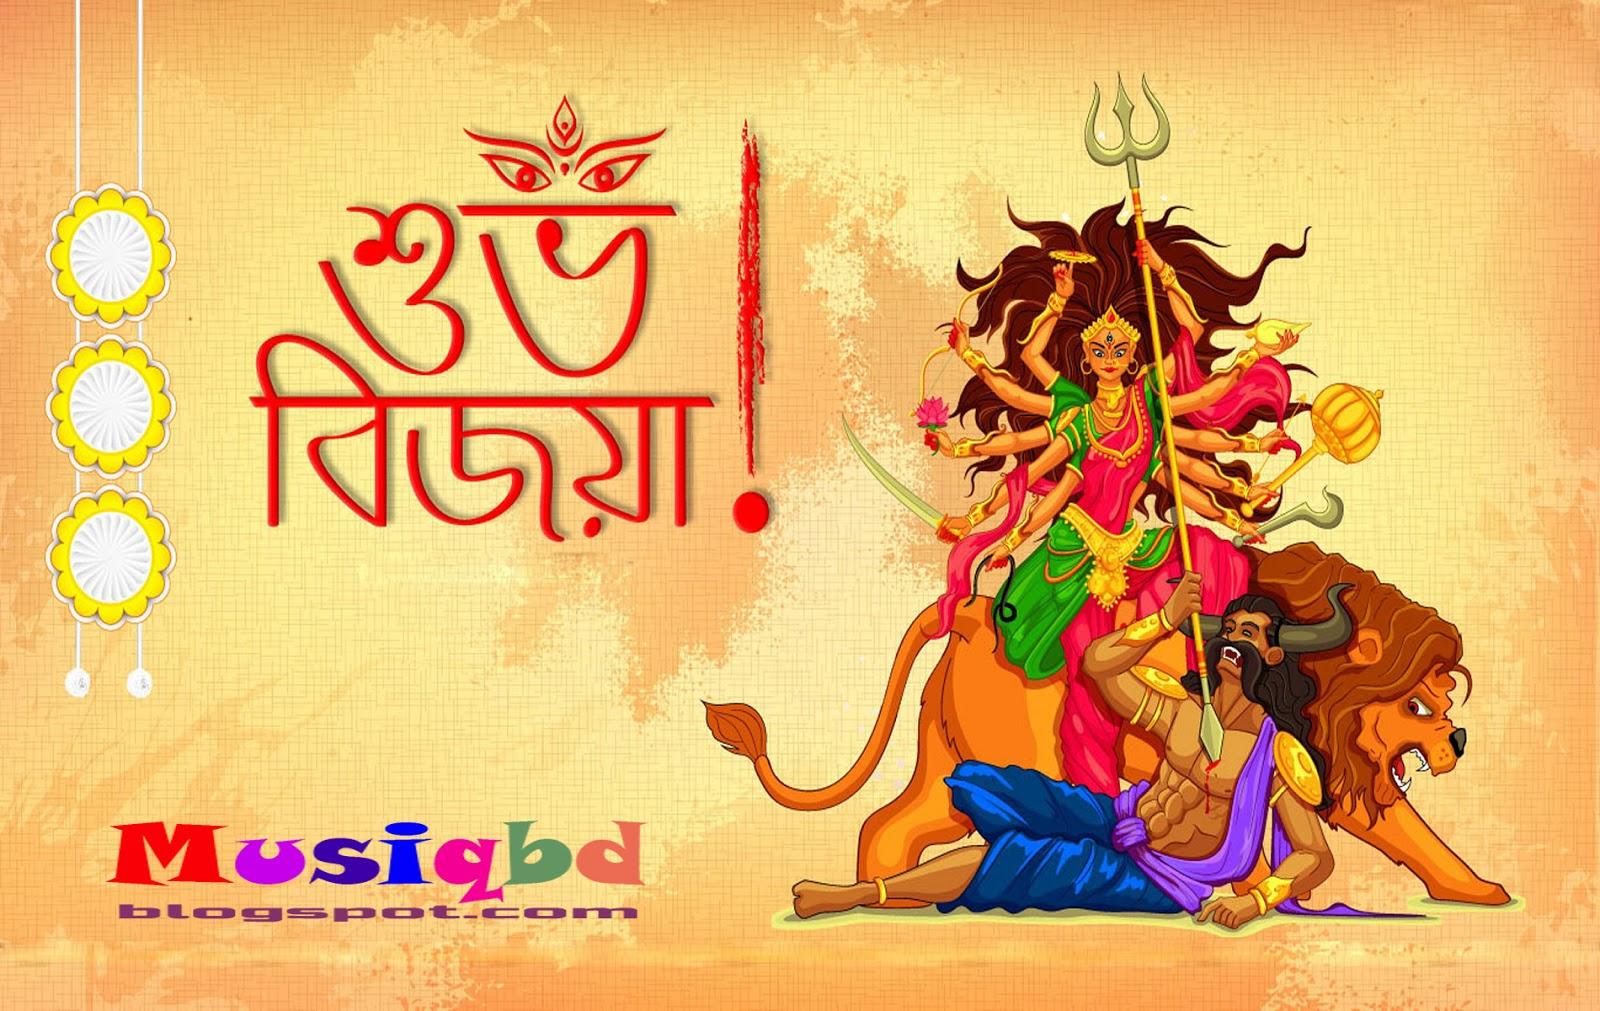 Sinhala & hindi mashup dileepa sranga ft dj aakshe on shaa fm.